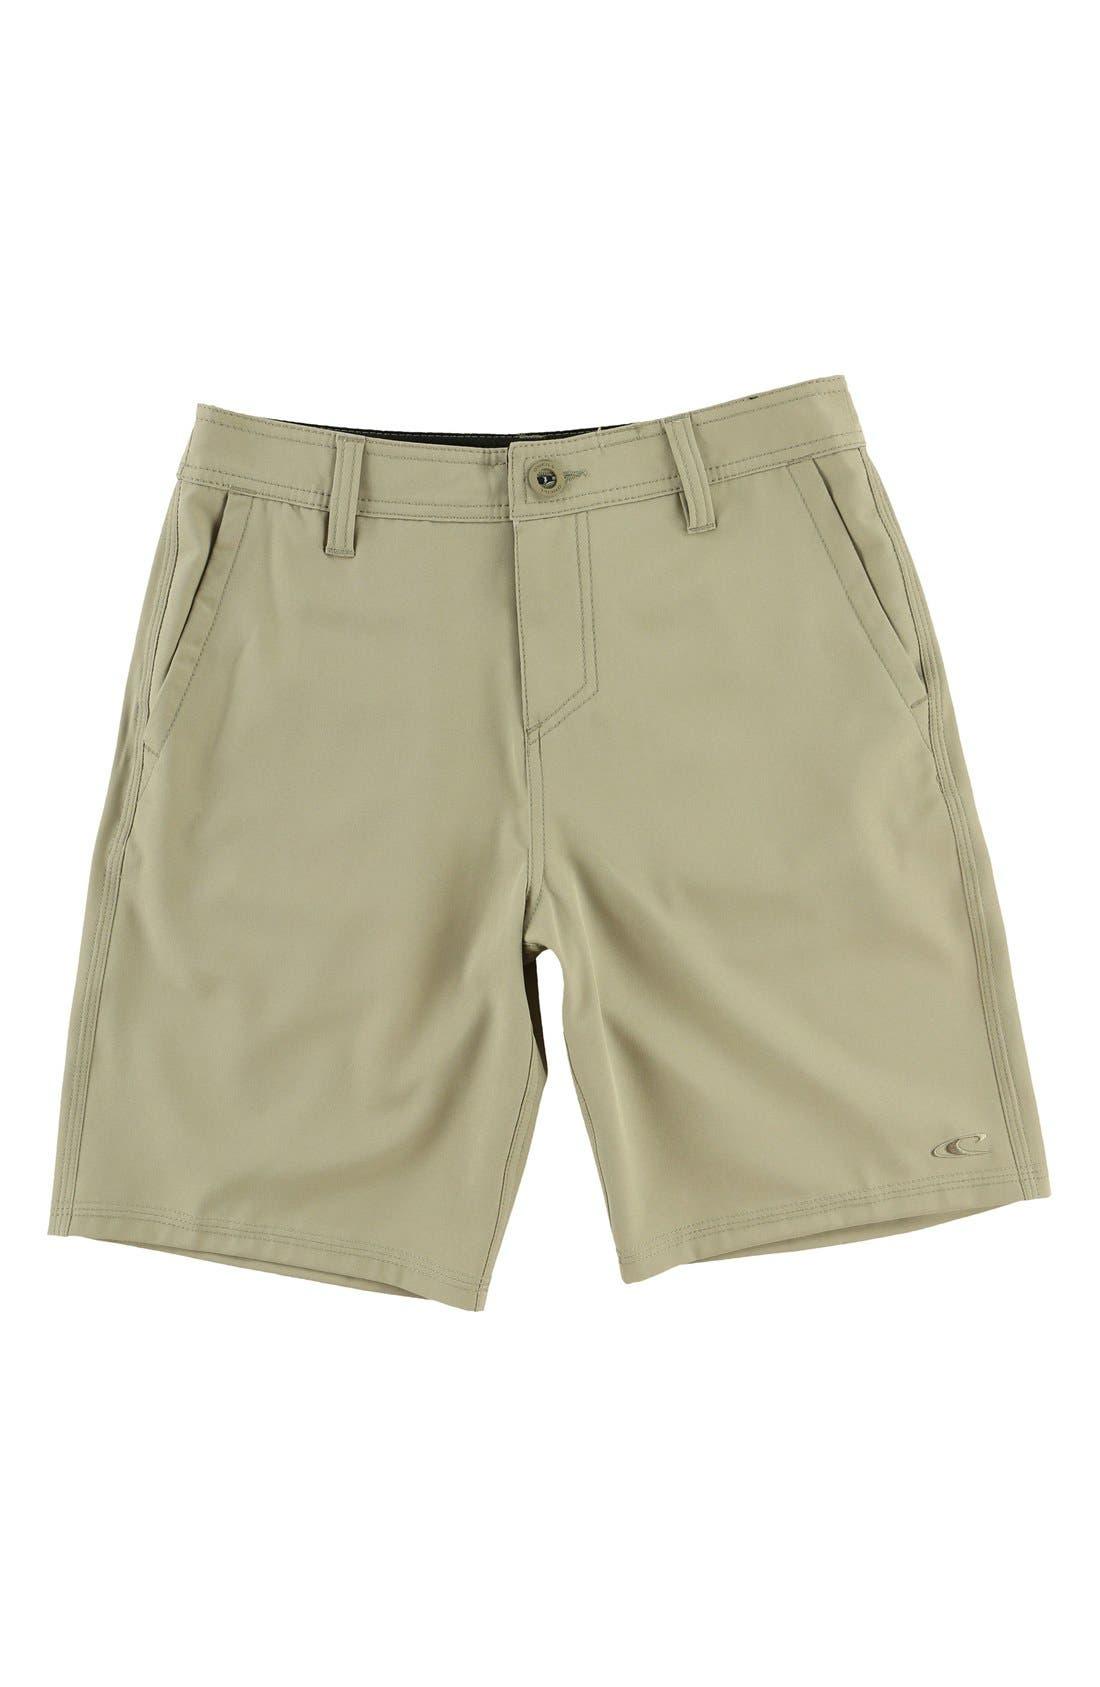 Loaded Hybrid Board Shorts,                         Main,                         color, Khaki